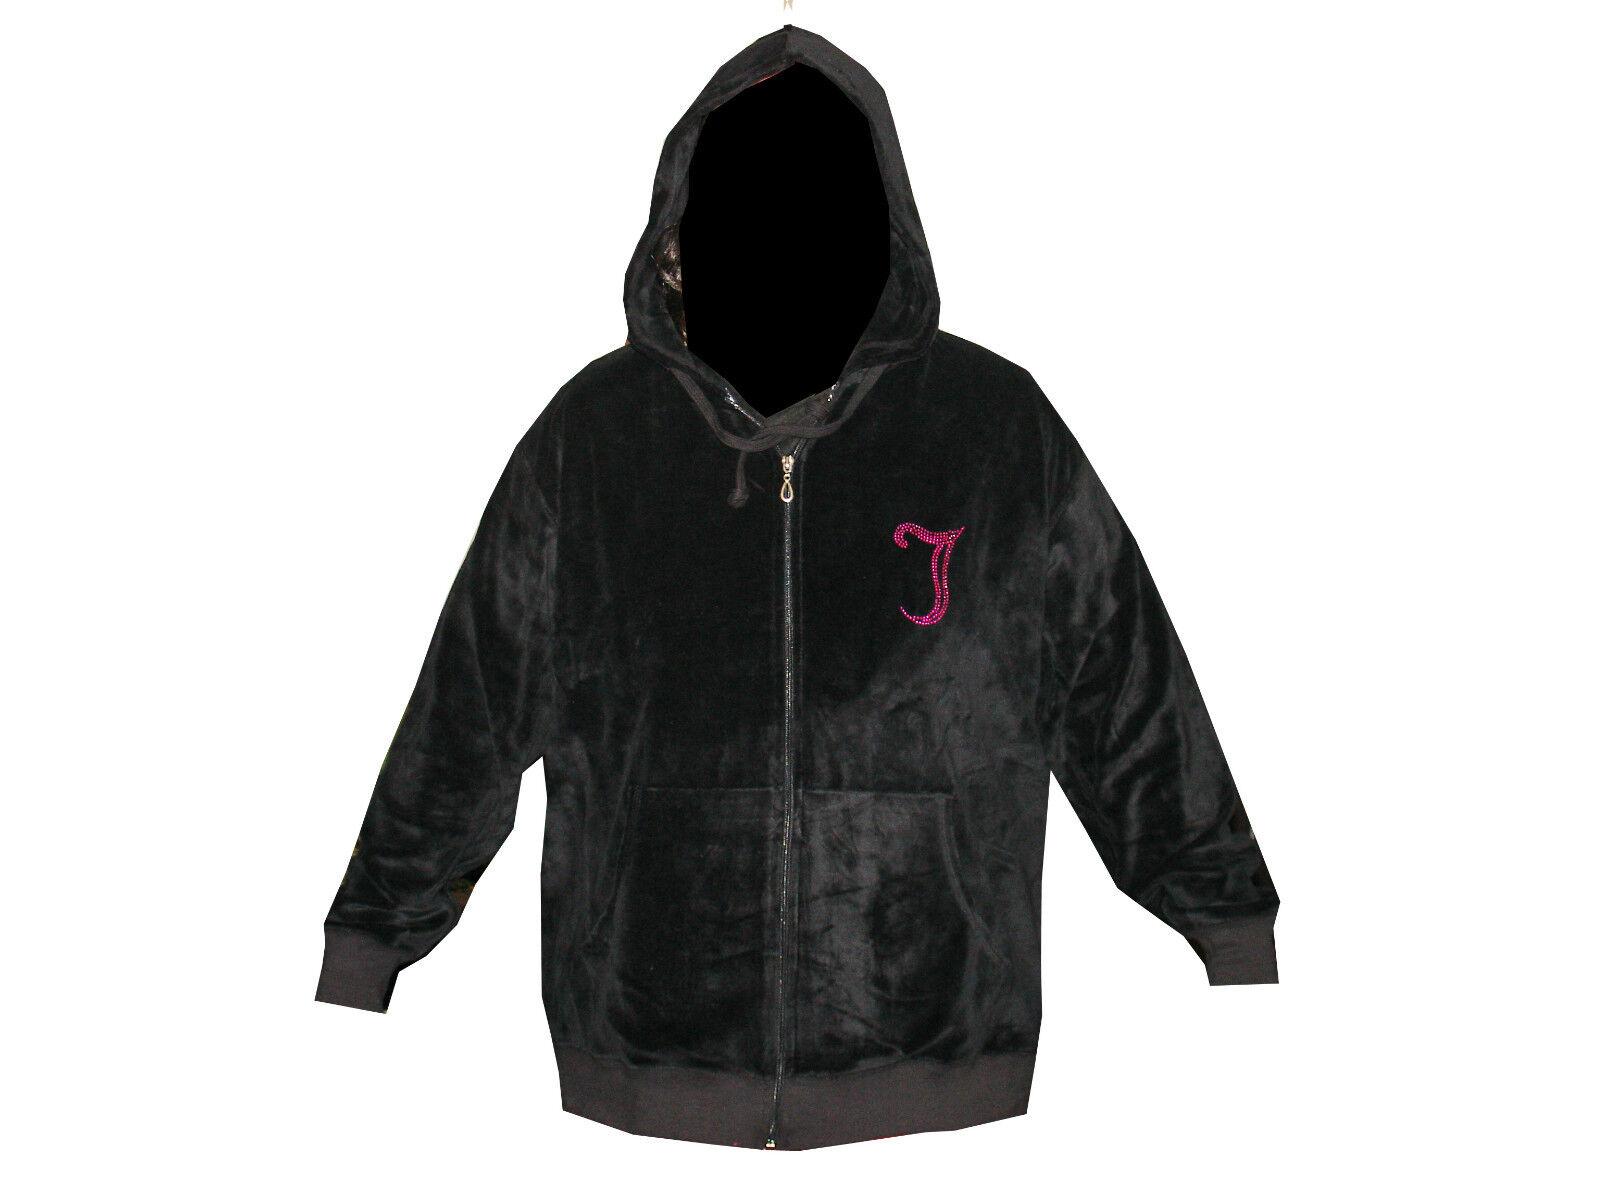 0313c90bc4f Curvaceous Clothing Plus Size Black Diamante Detail Velour Hoody ...